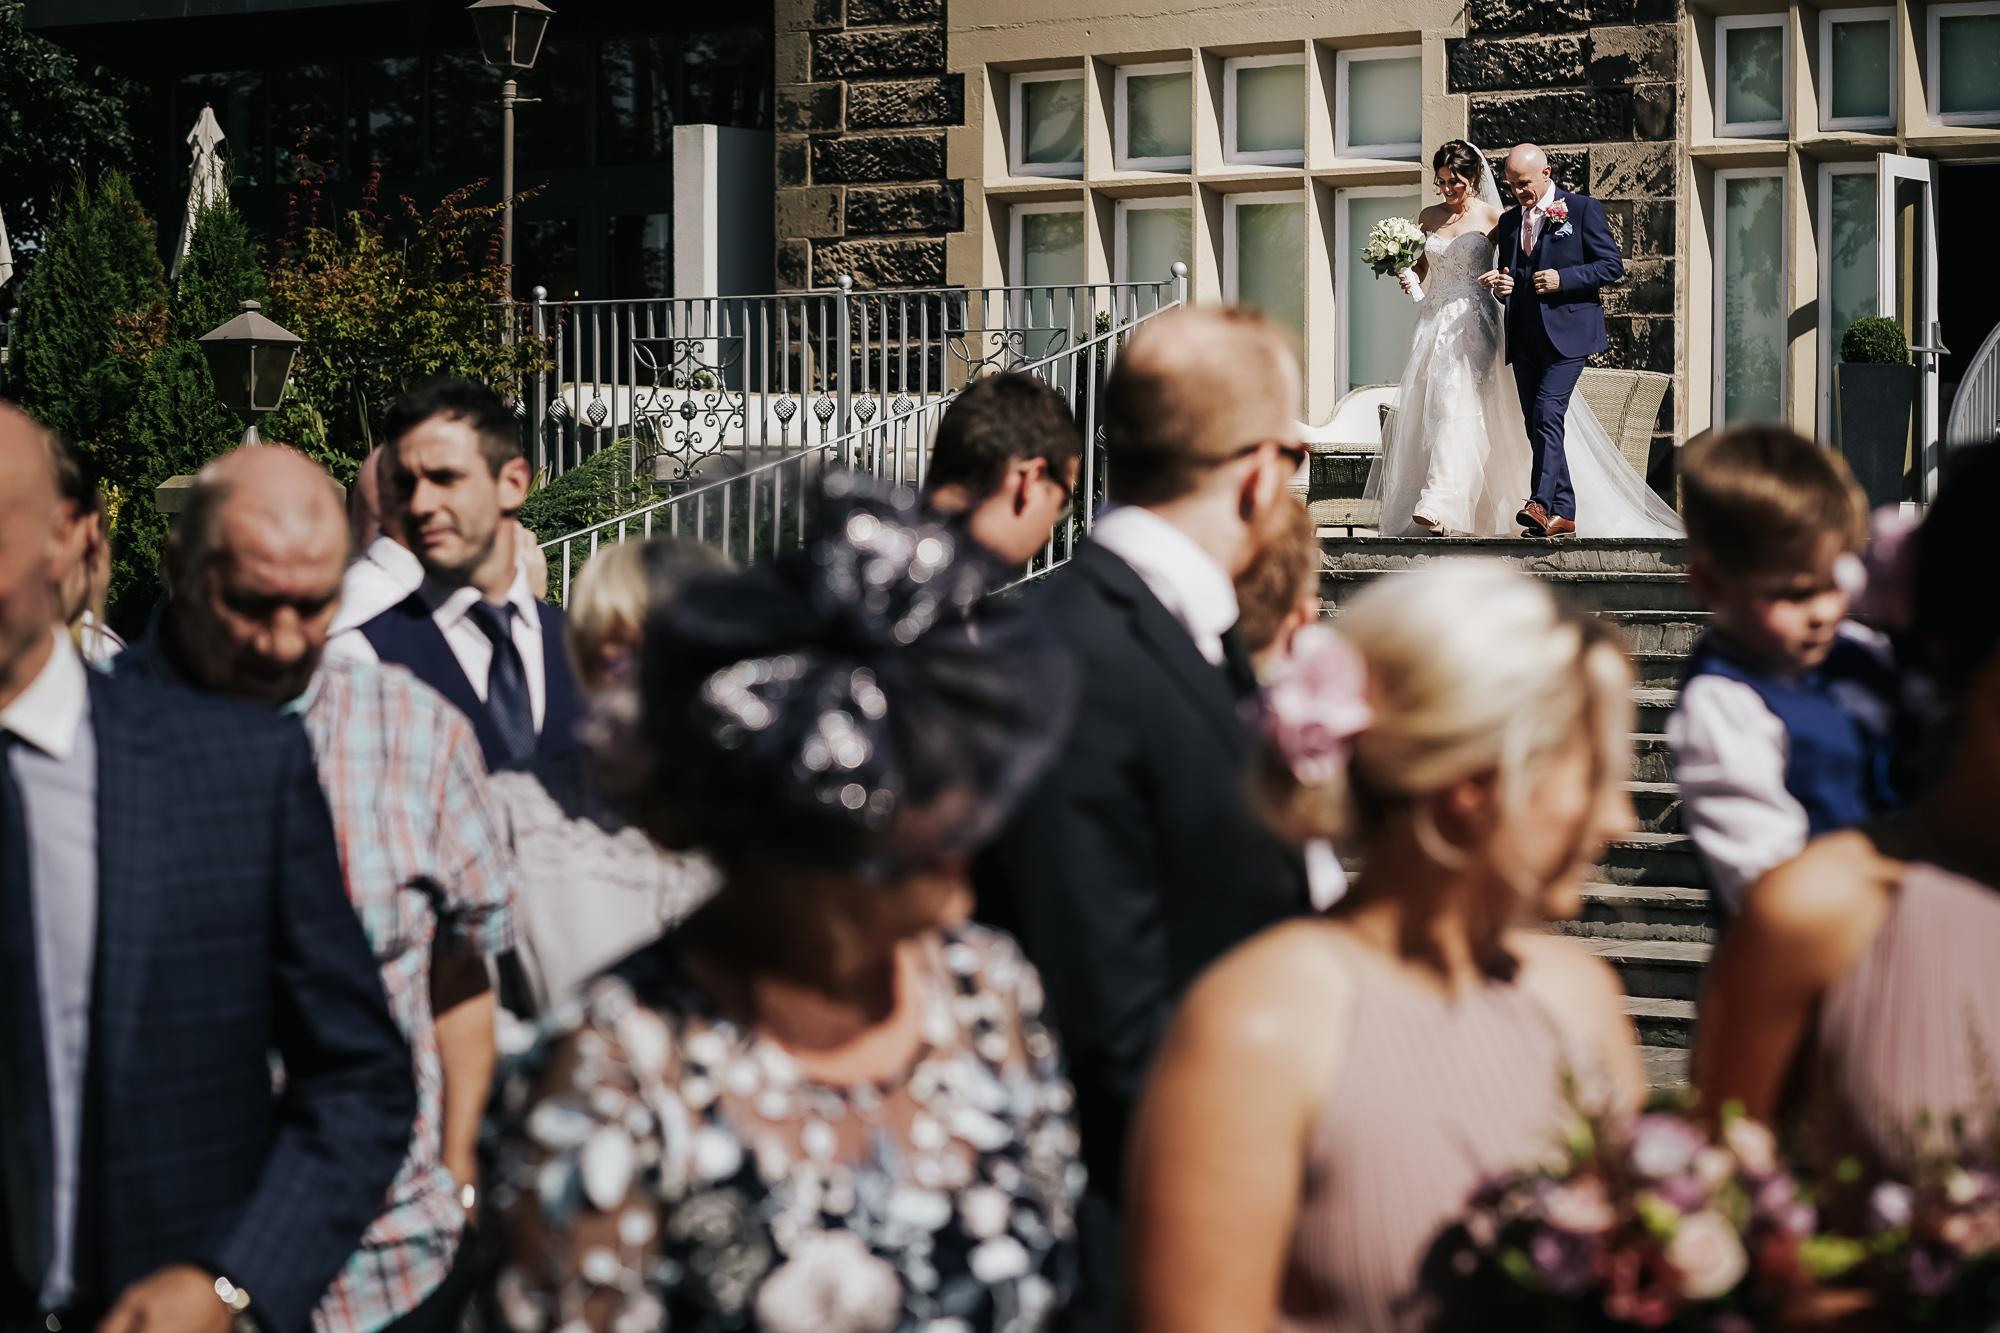 West Tower Wedding Venue Orkskirk Lancashire Wedding Photography cheshire wedding photographer (12 of 47).jpg